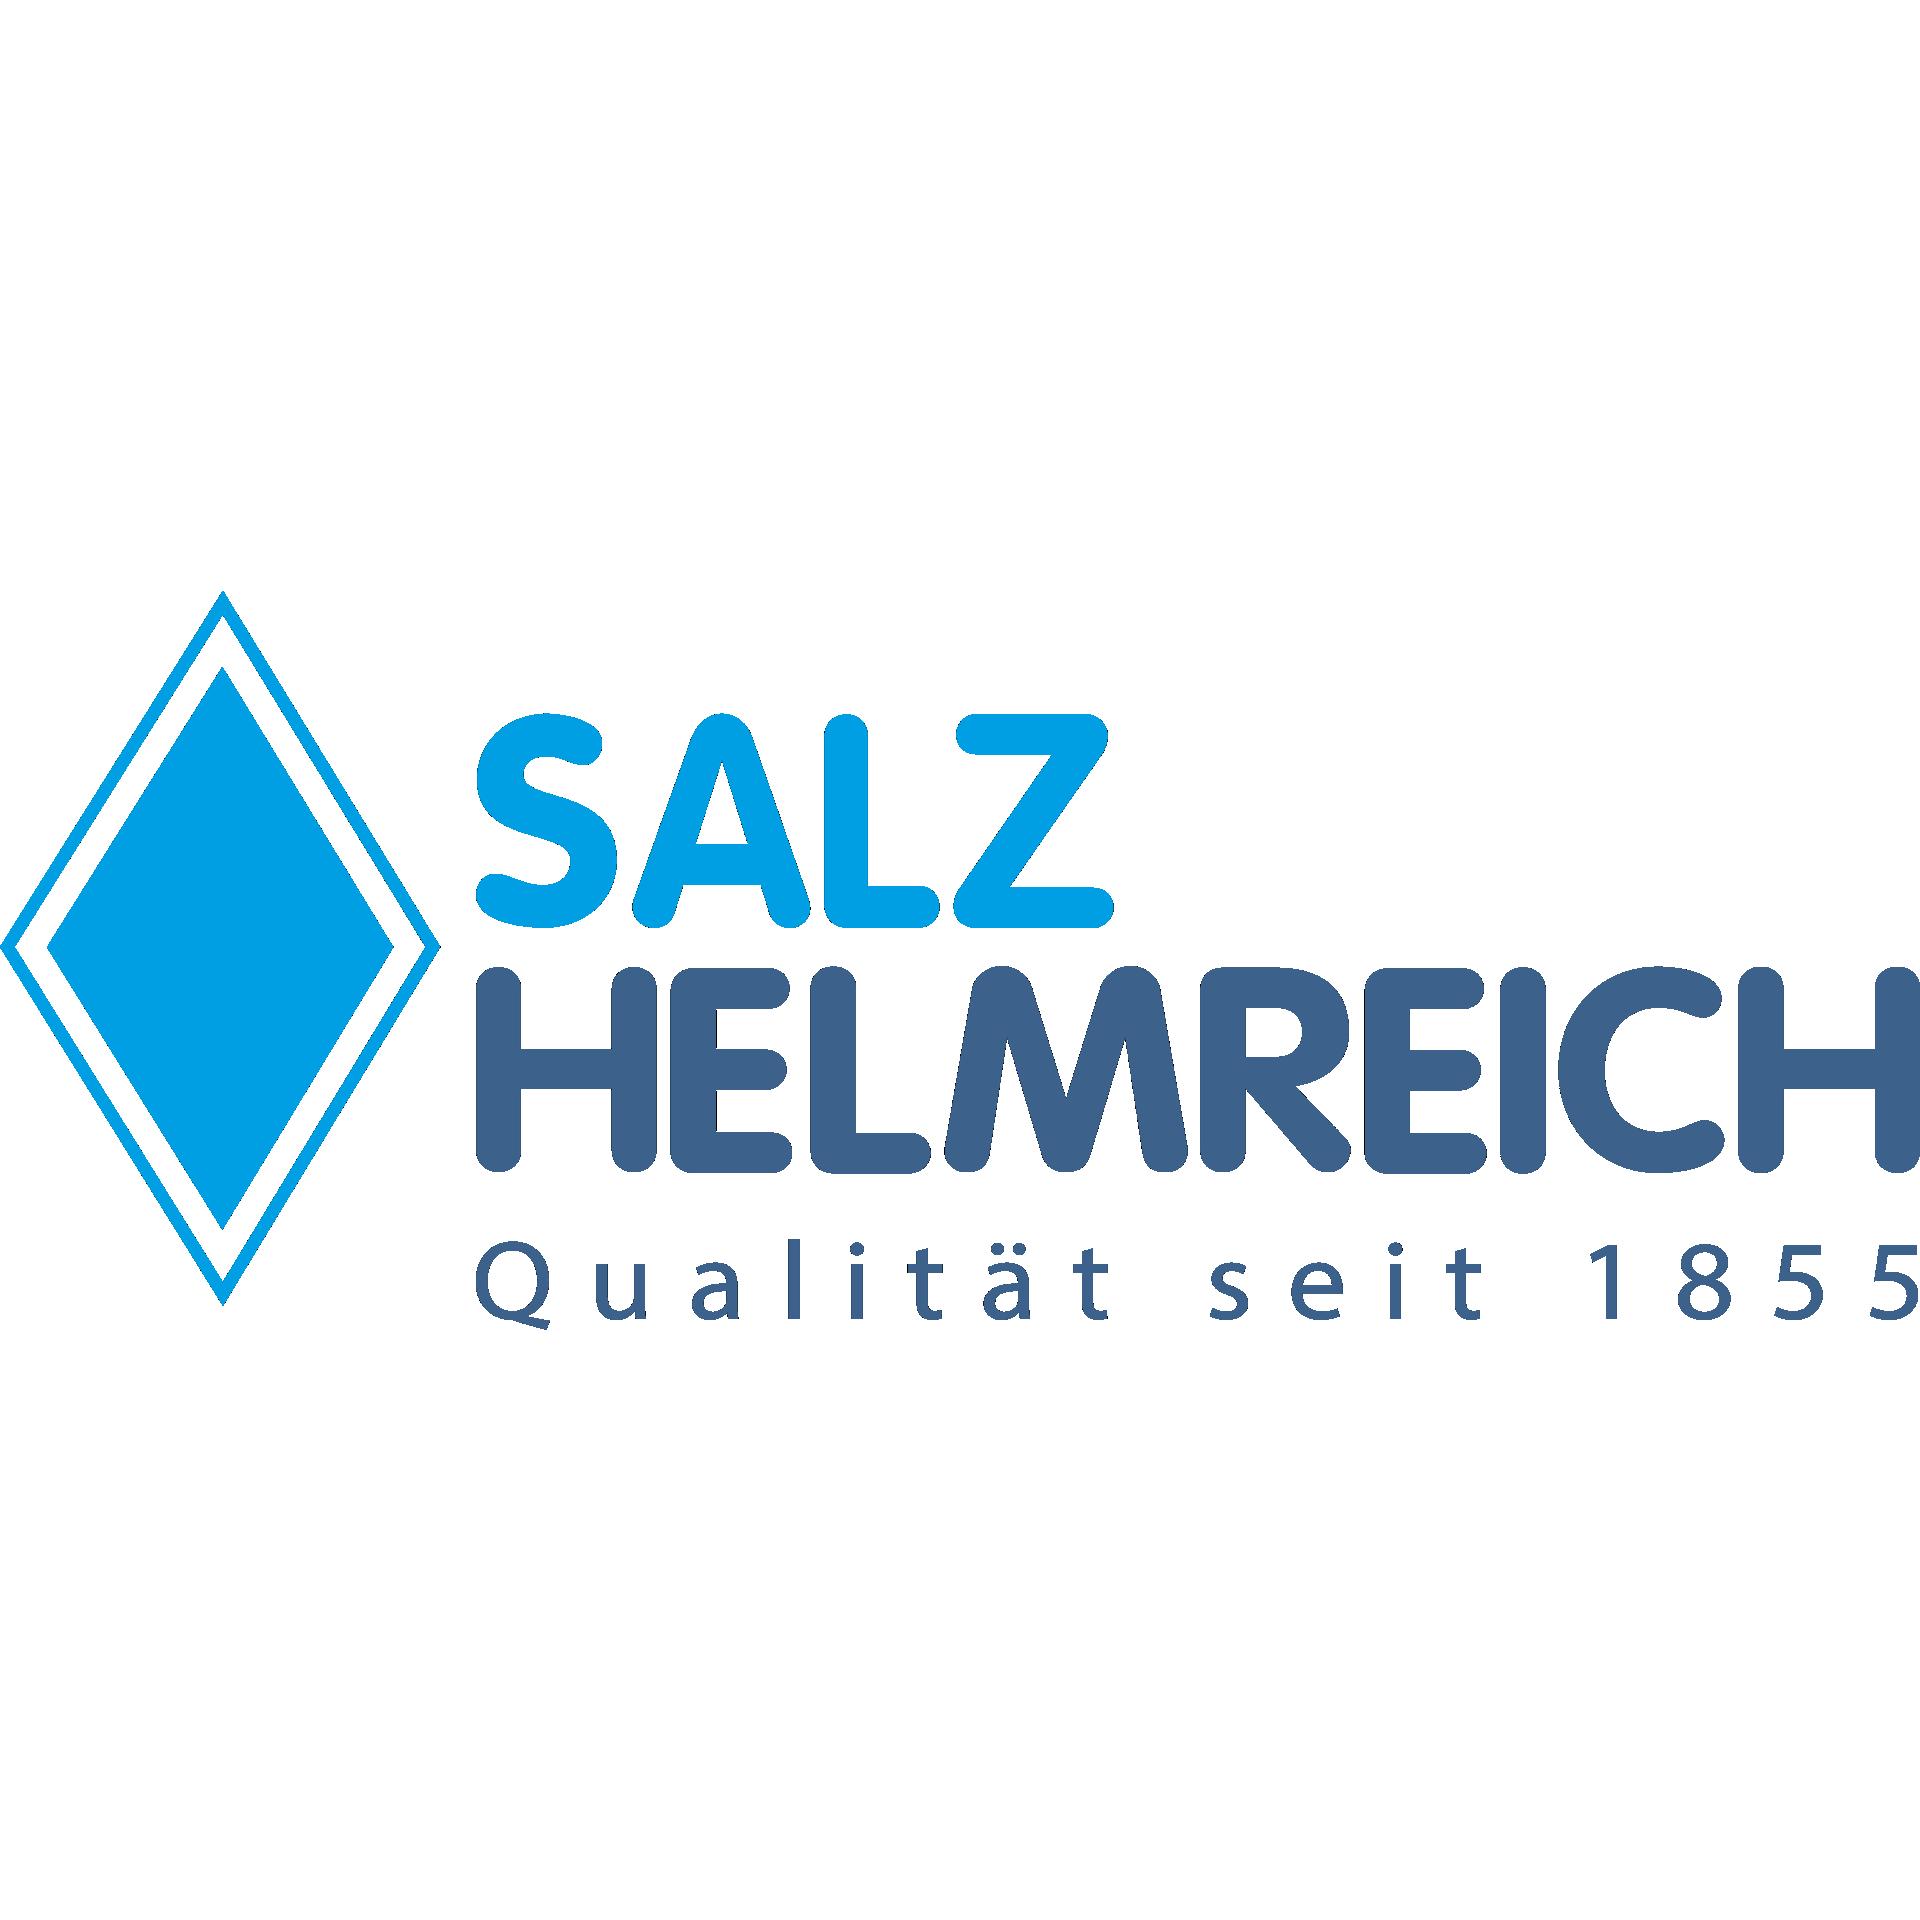 Siede - Speisesalz Standard 0,10-0,71 mm im 25kg Sack